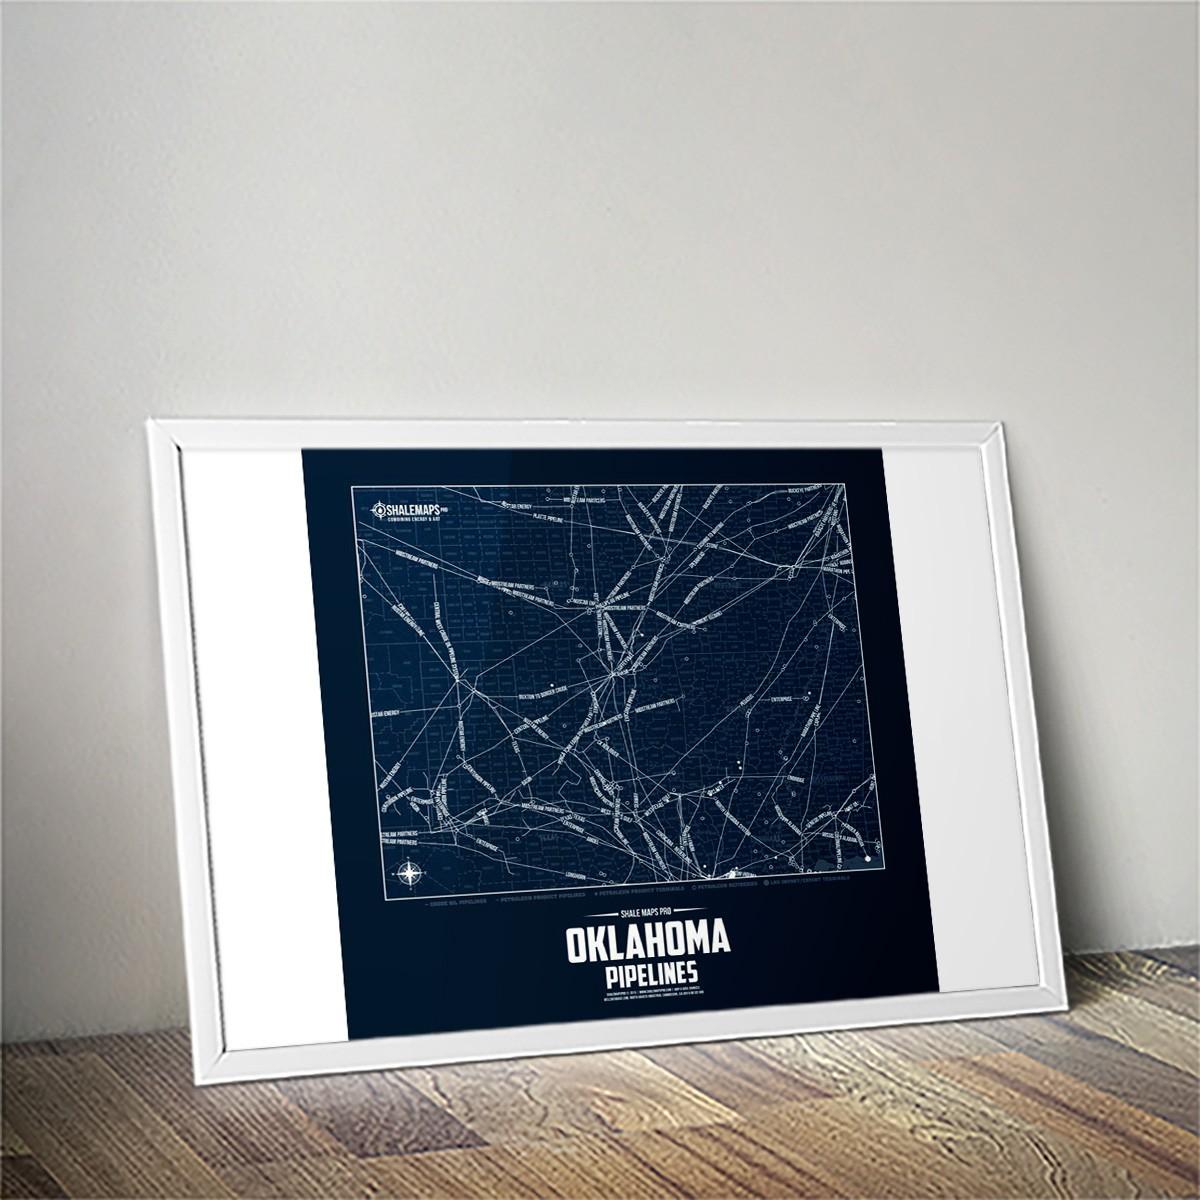 Oklahoma Oil & Gas Pipeline Blueprint